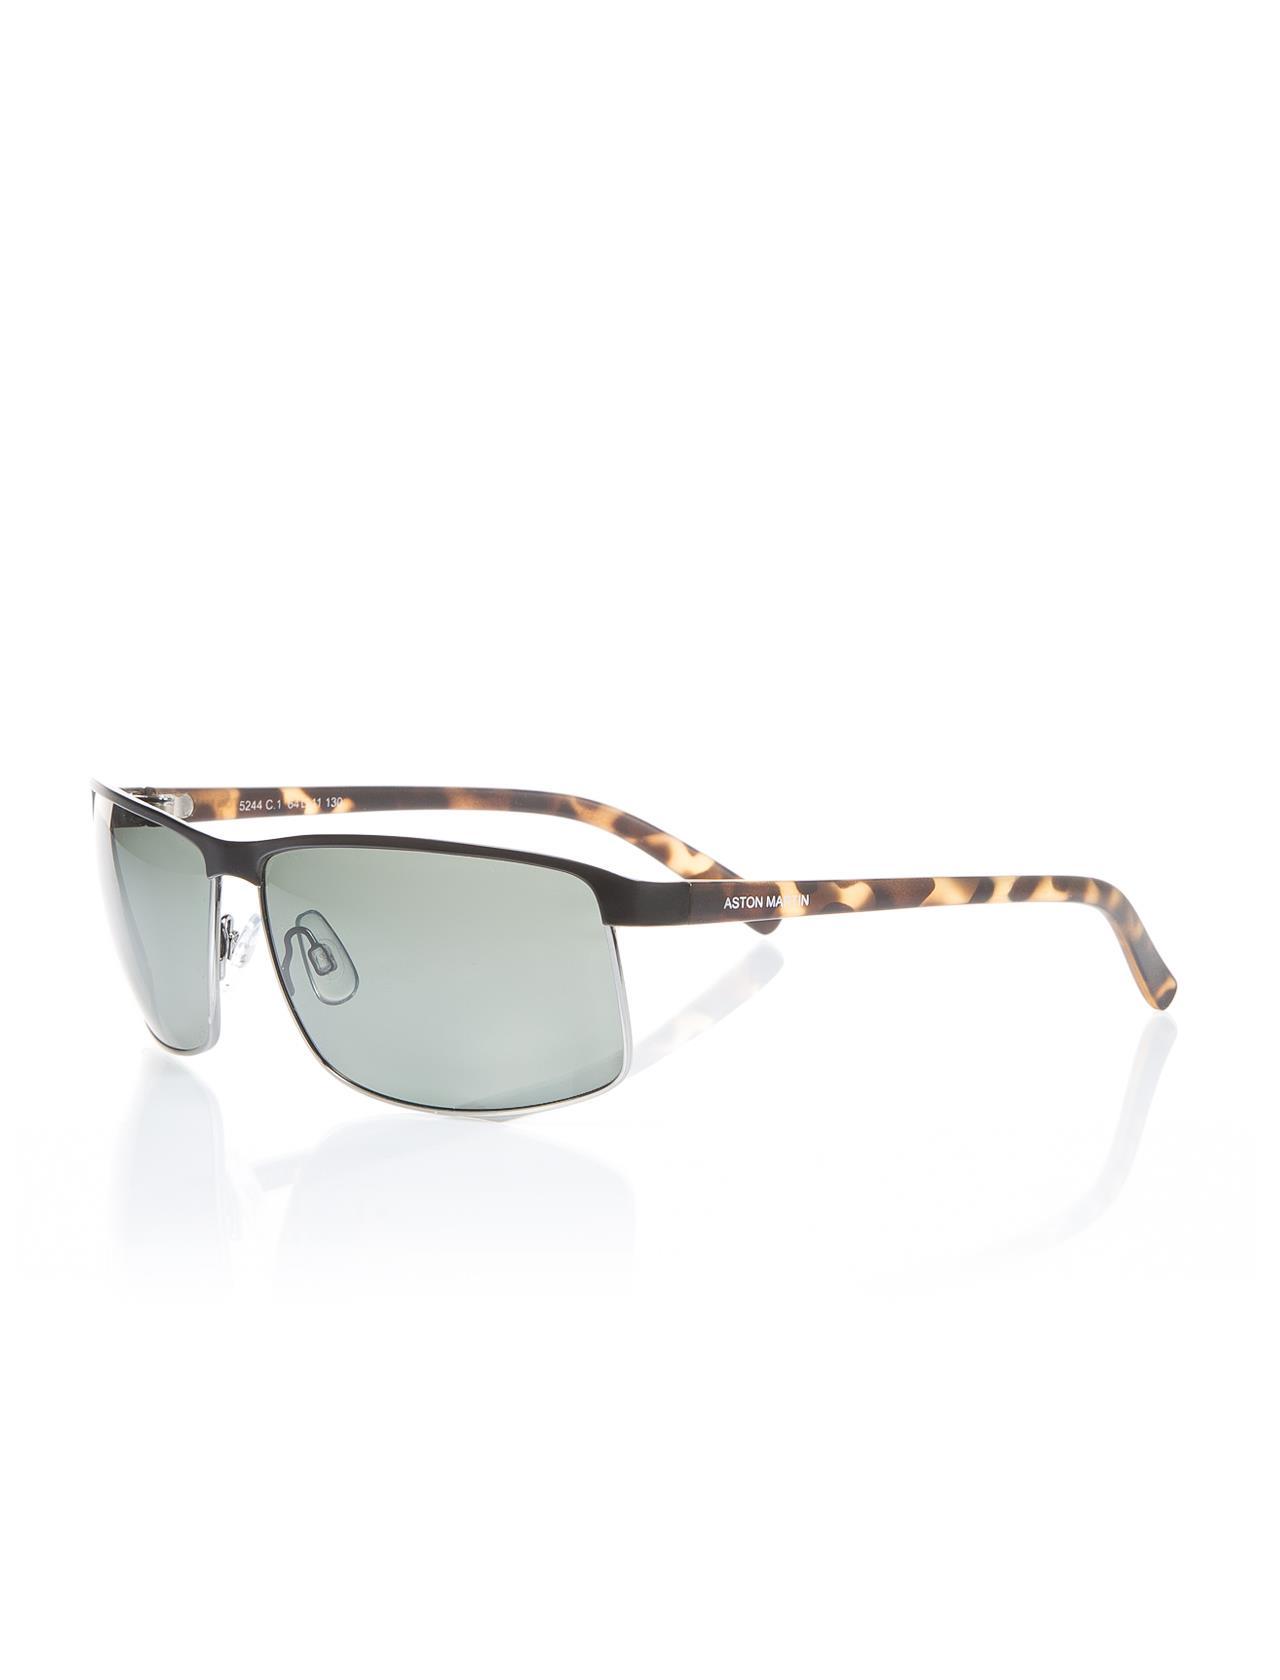 Men's New Design Sunglasses